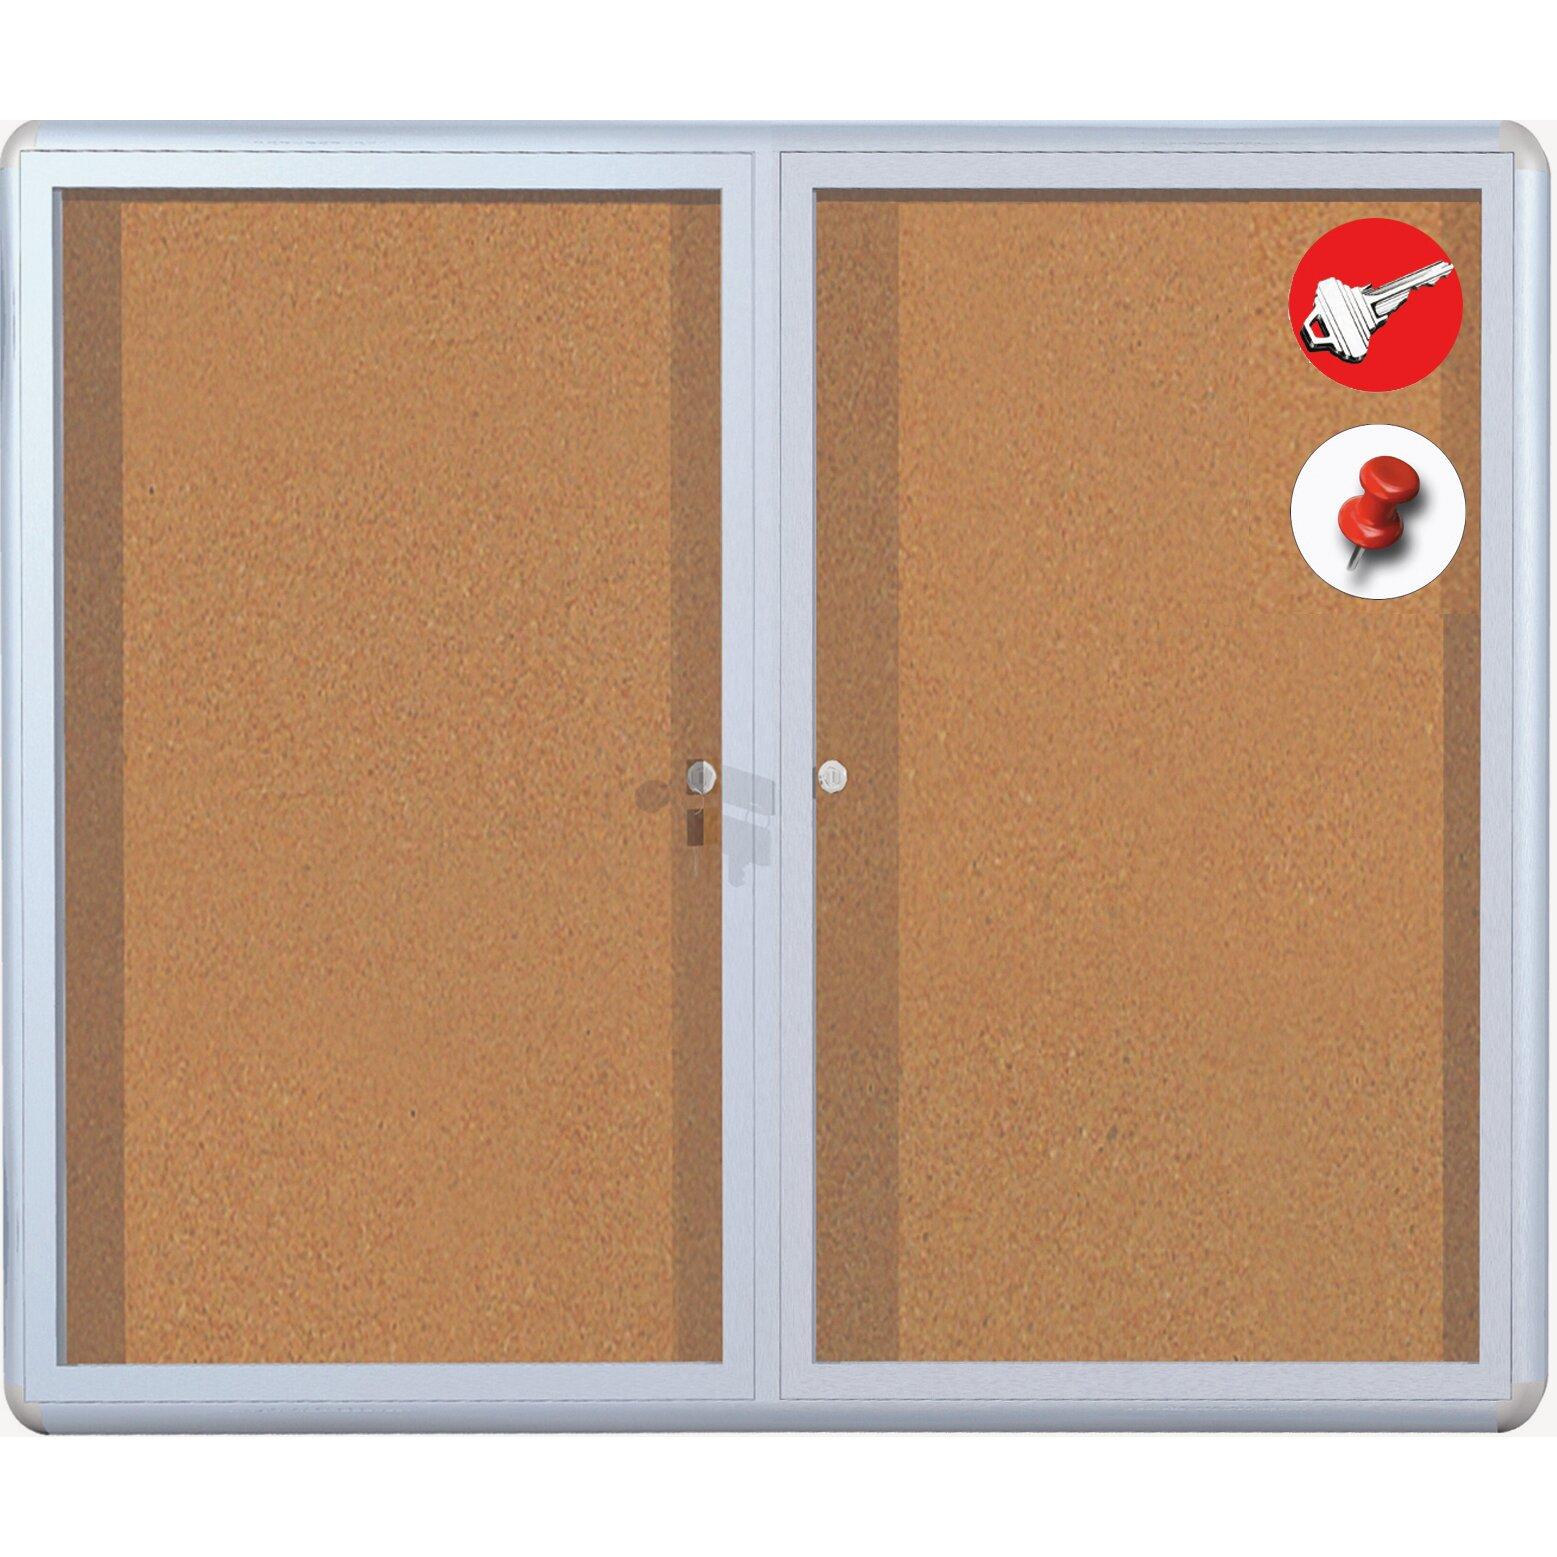 mastervision cork display case wall mounted bulletin board wayfair. Black Bedroom Furniture Sets. Home Design Ideas